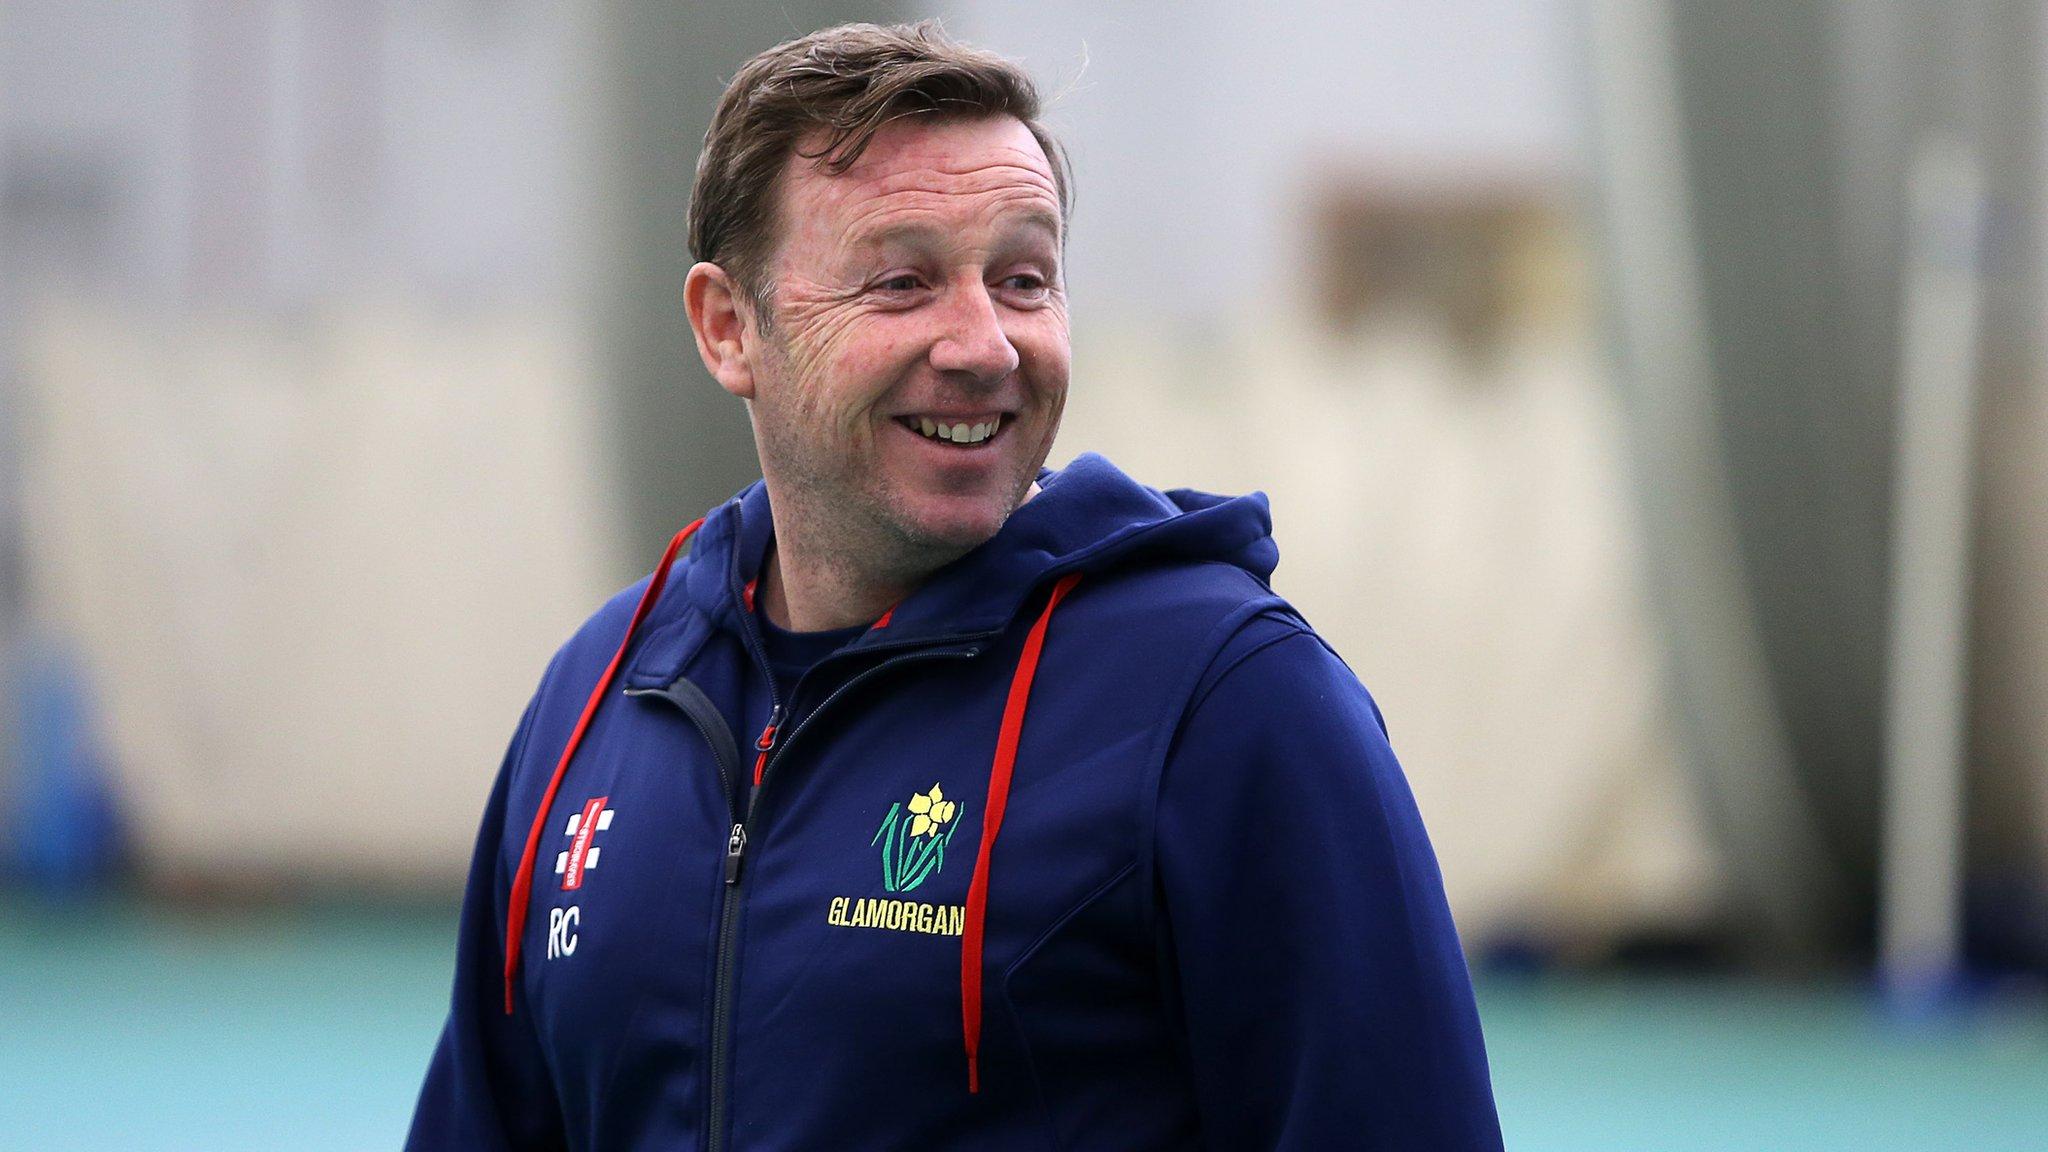 Glamorgan Cricket: Boss Hugh Morris orders external review after dismal season